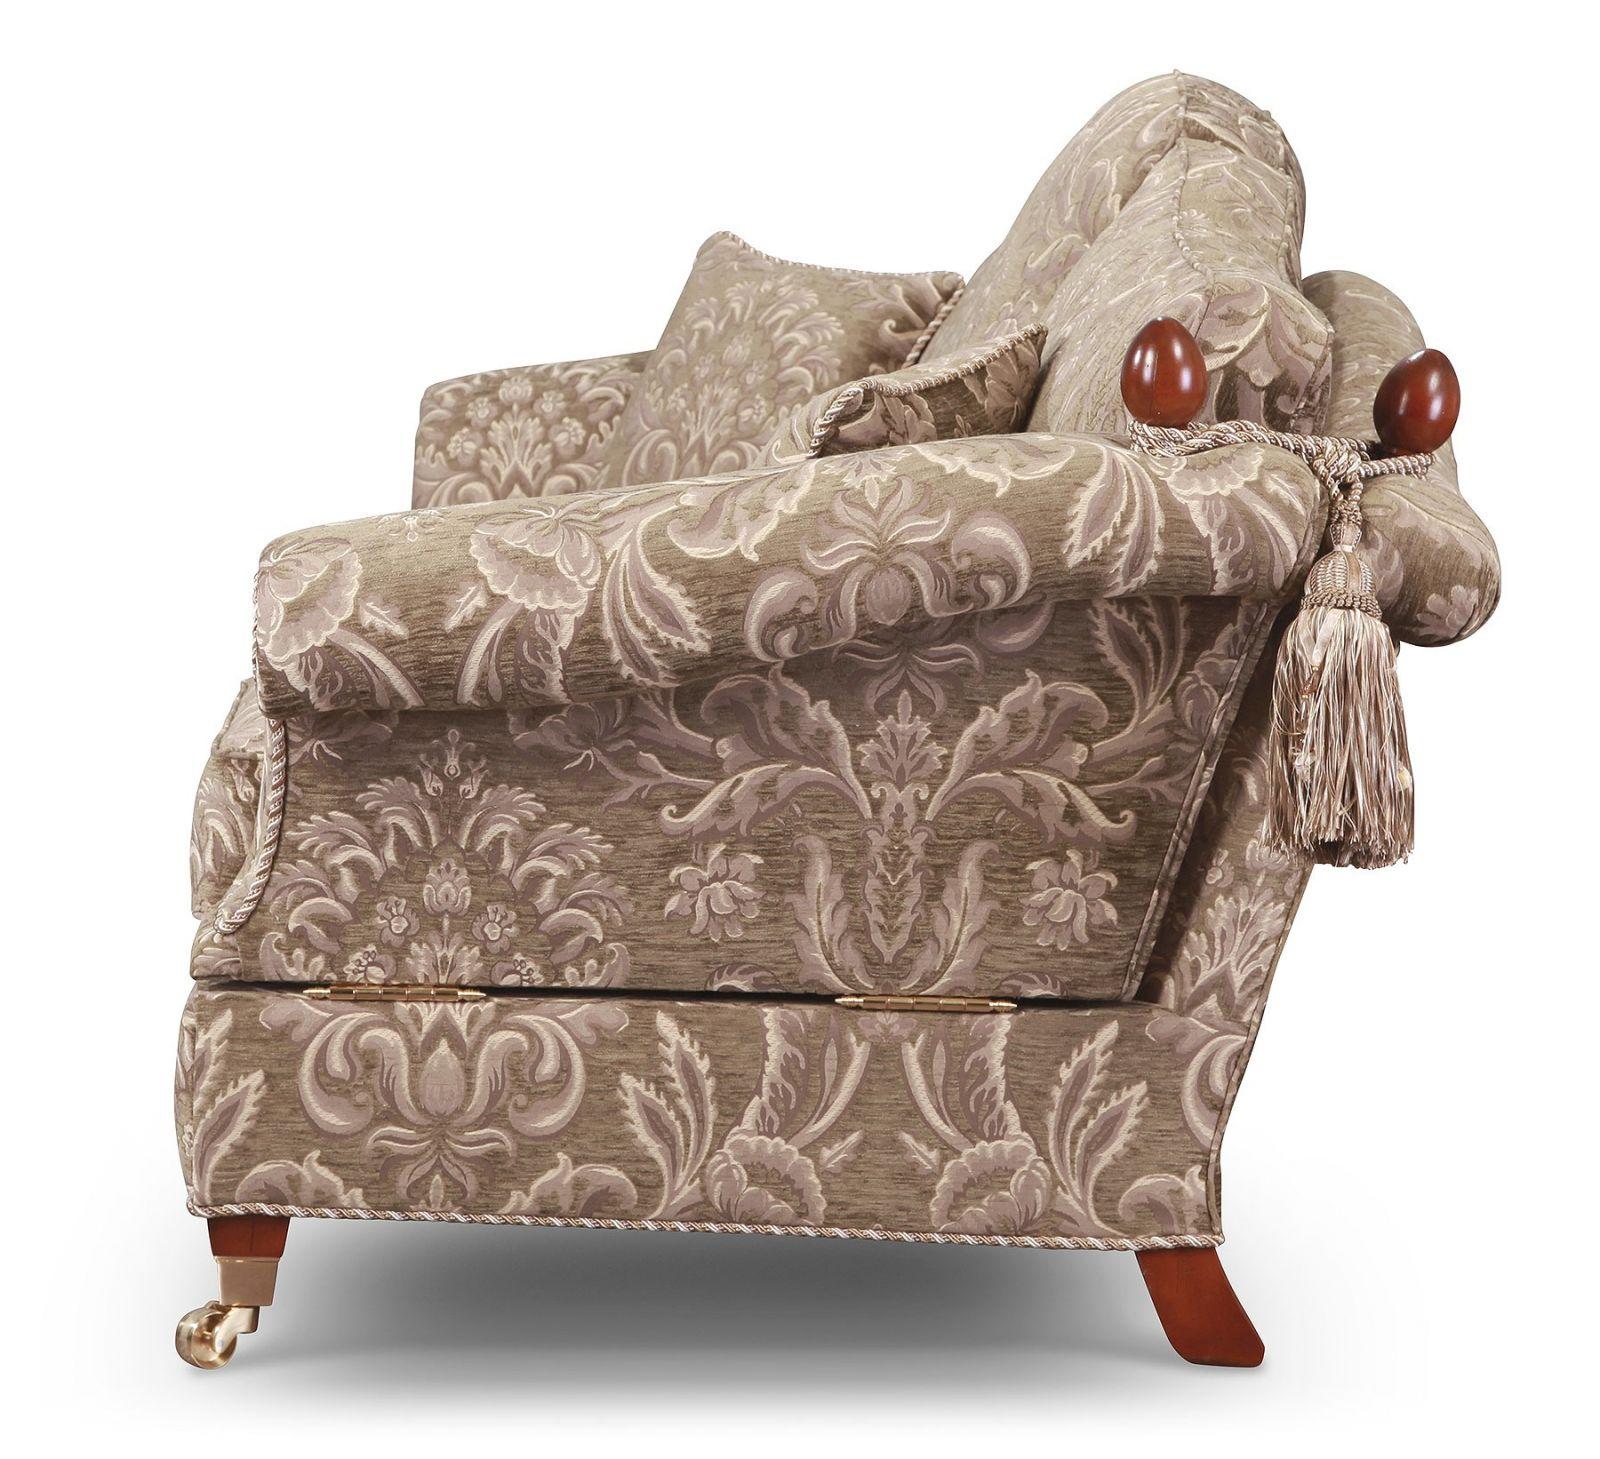 Renoir Knole 3 seat sofa in grey-green chenille